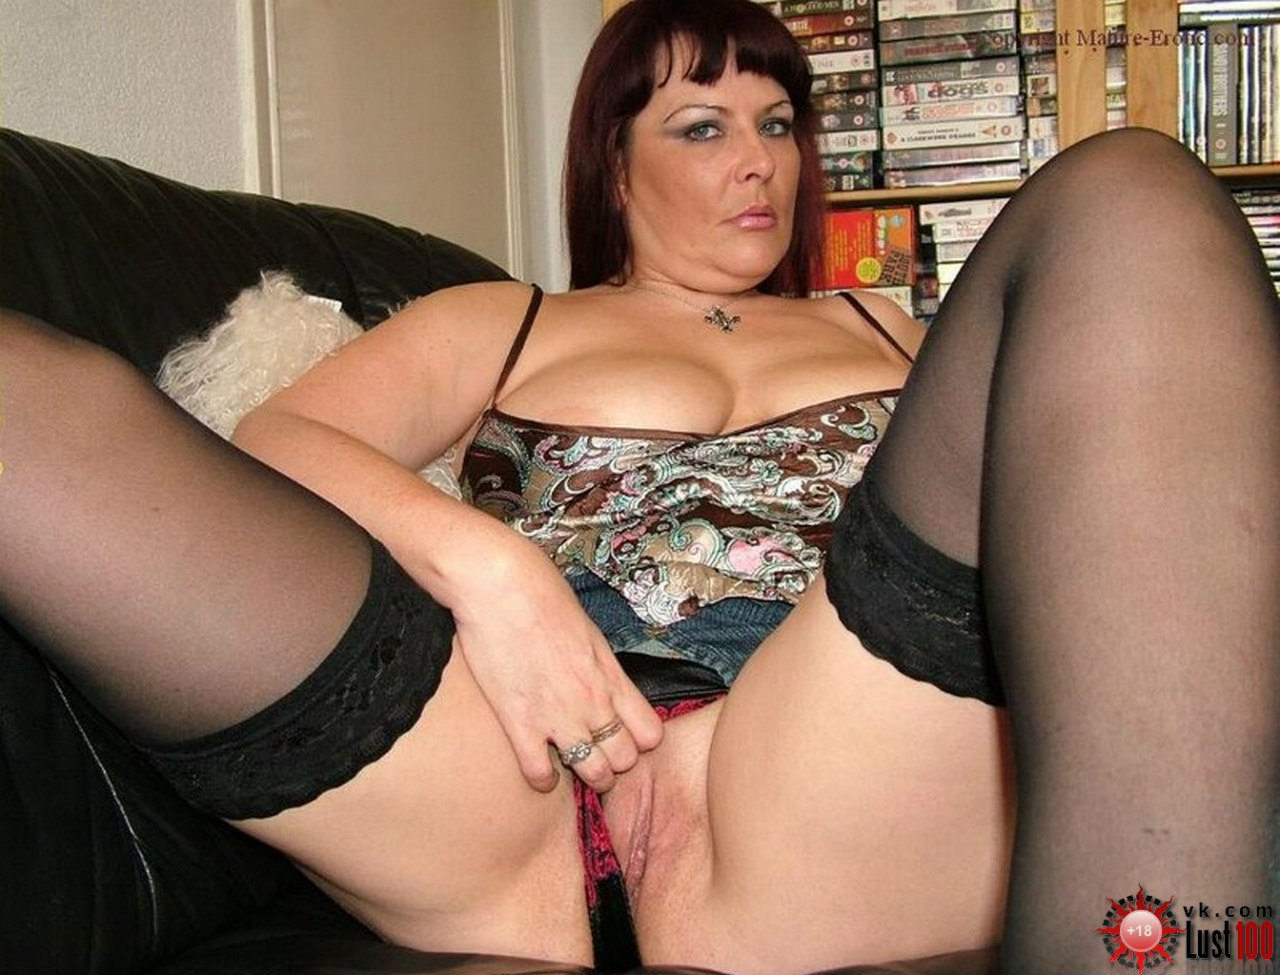 Порно галереи со зрелыми дамами женских